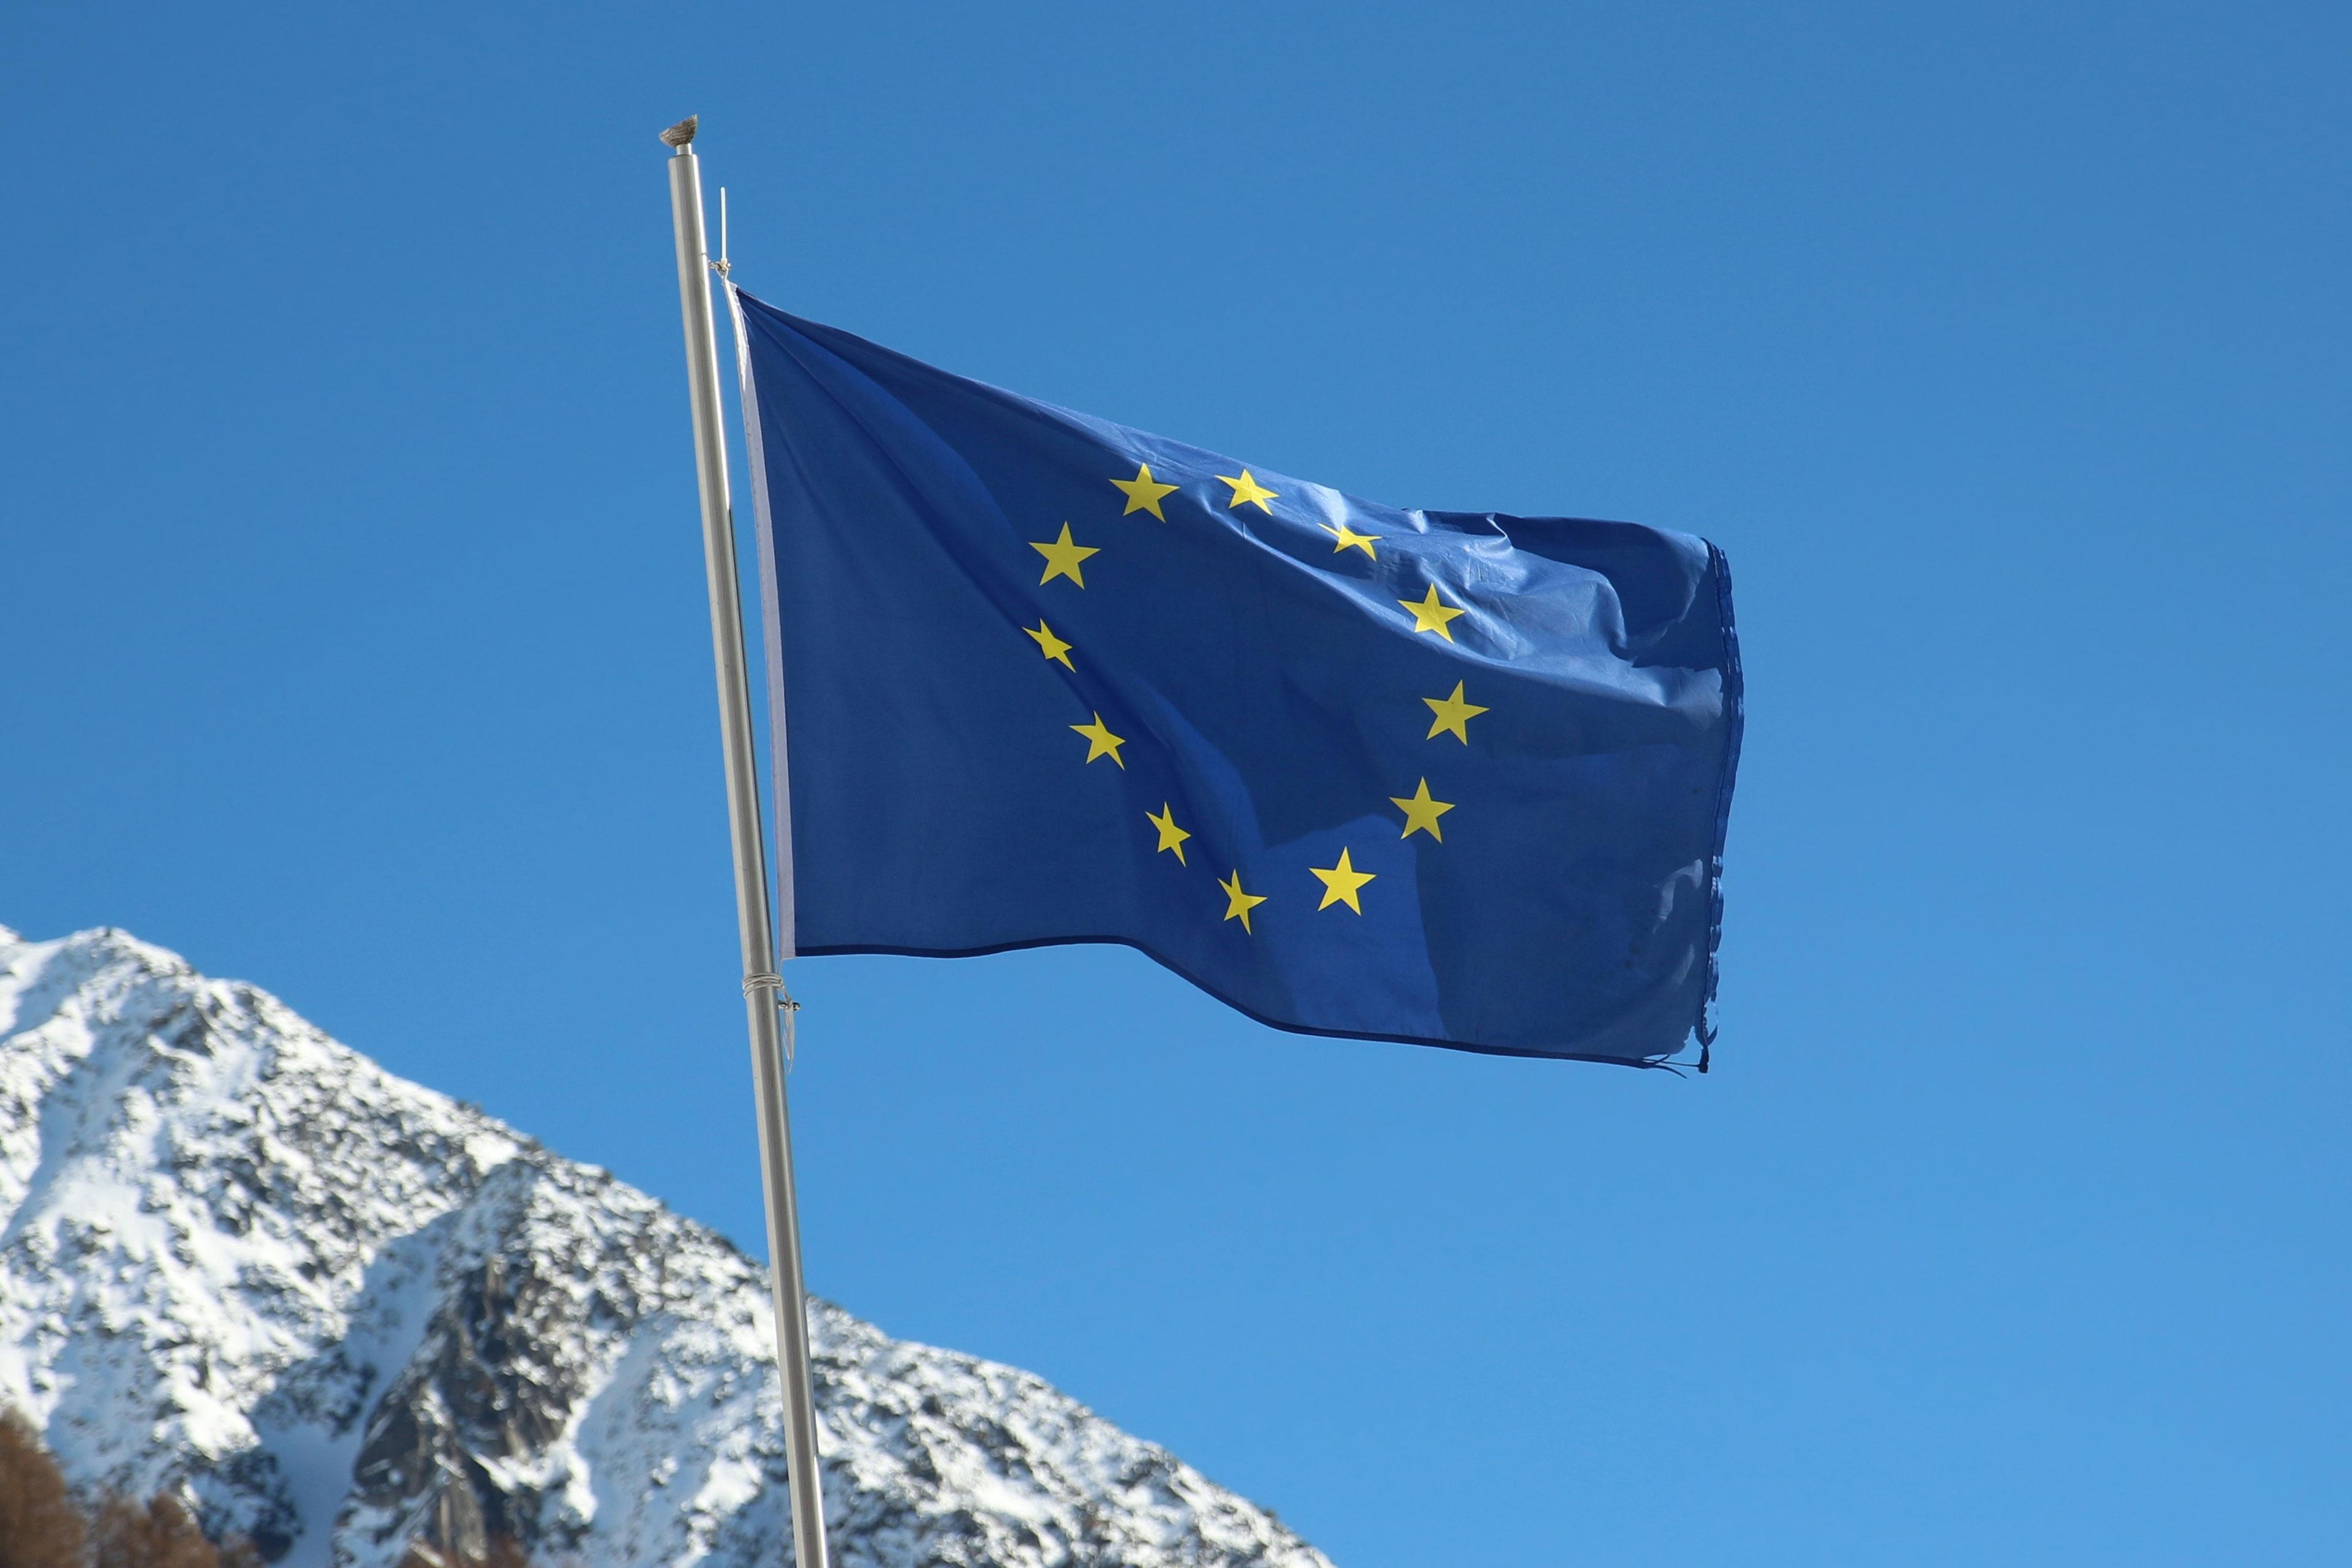 EU flag against mountains